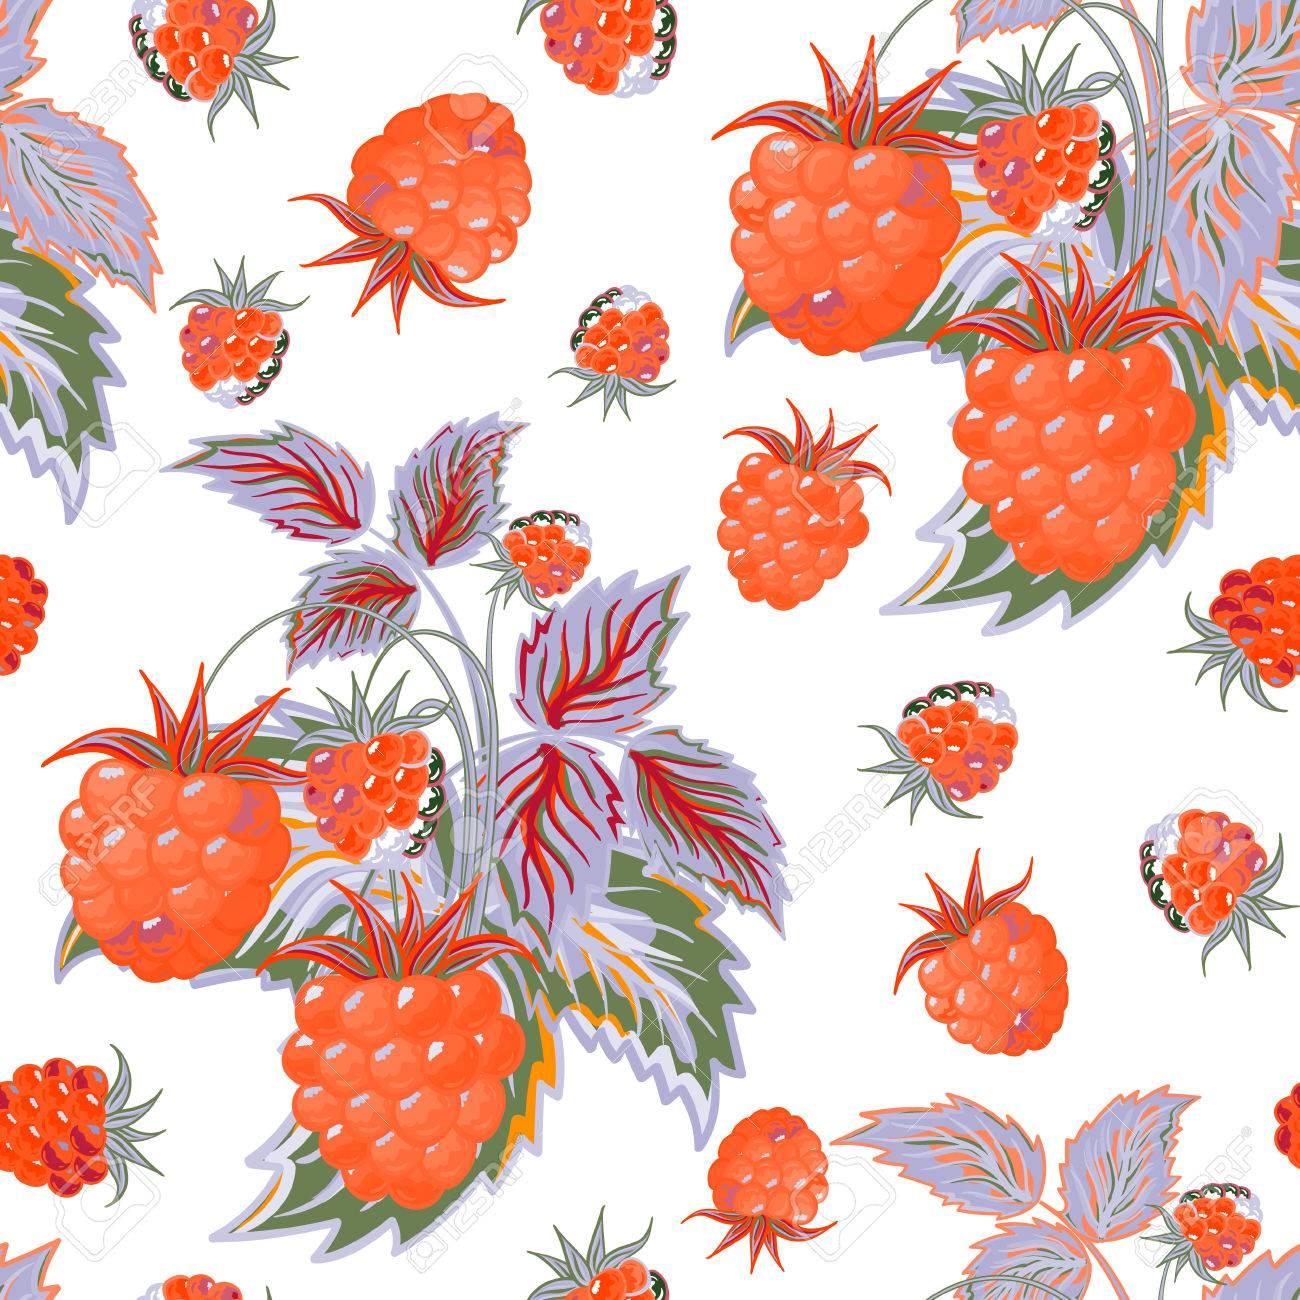 Seamless Pattern With Orange Raspberries In Cartoon Style Hand